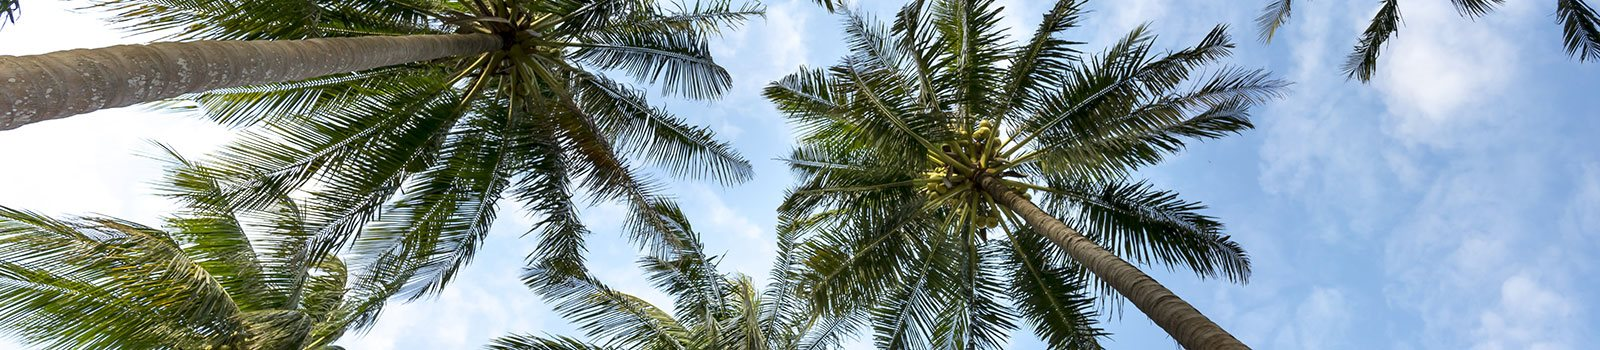 Palm trees_Riverwalk II Apartments, Homestead, FL